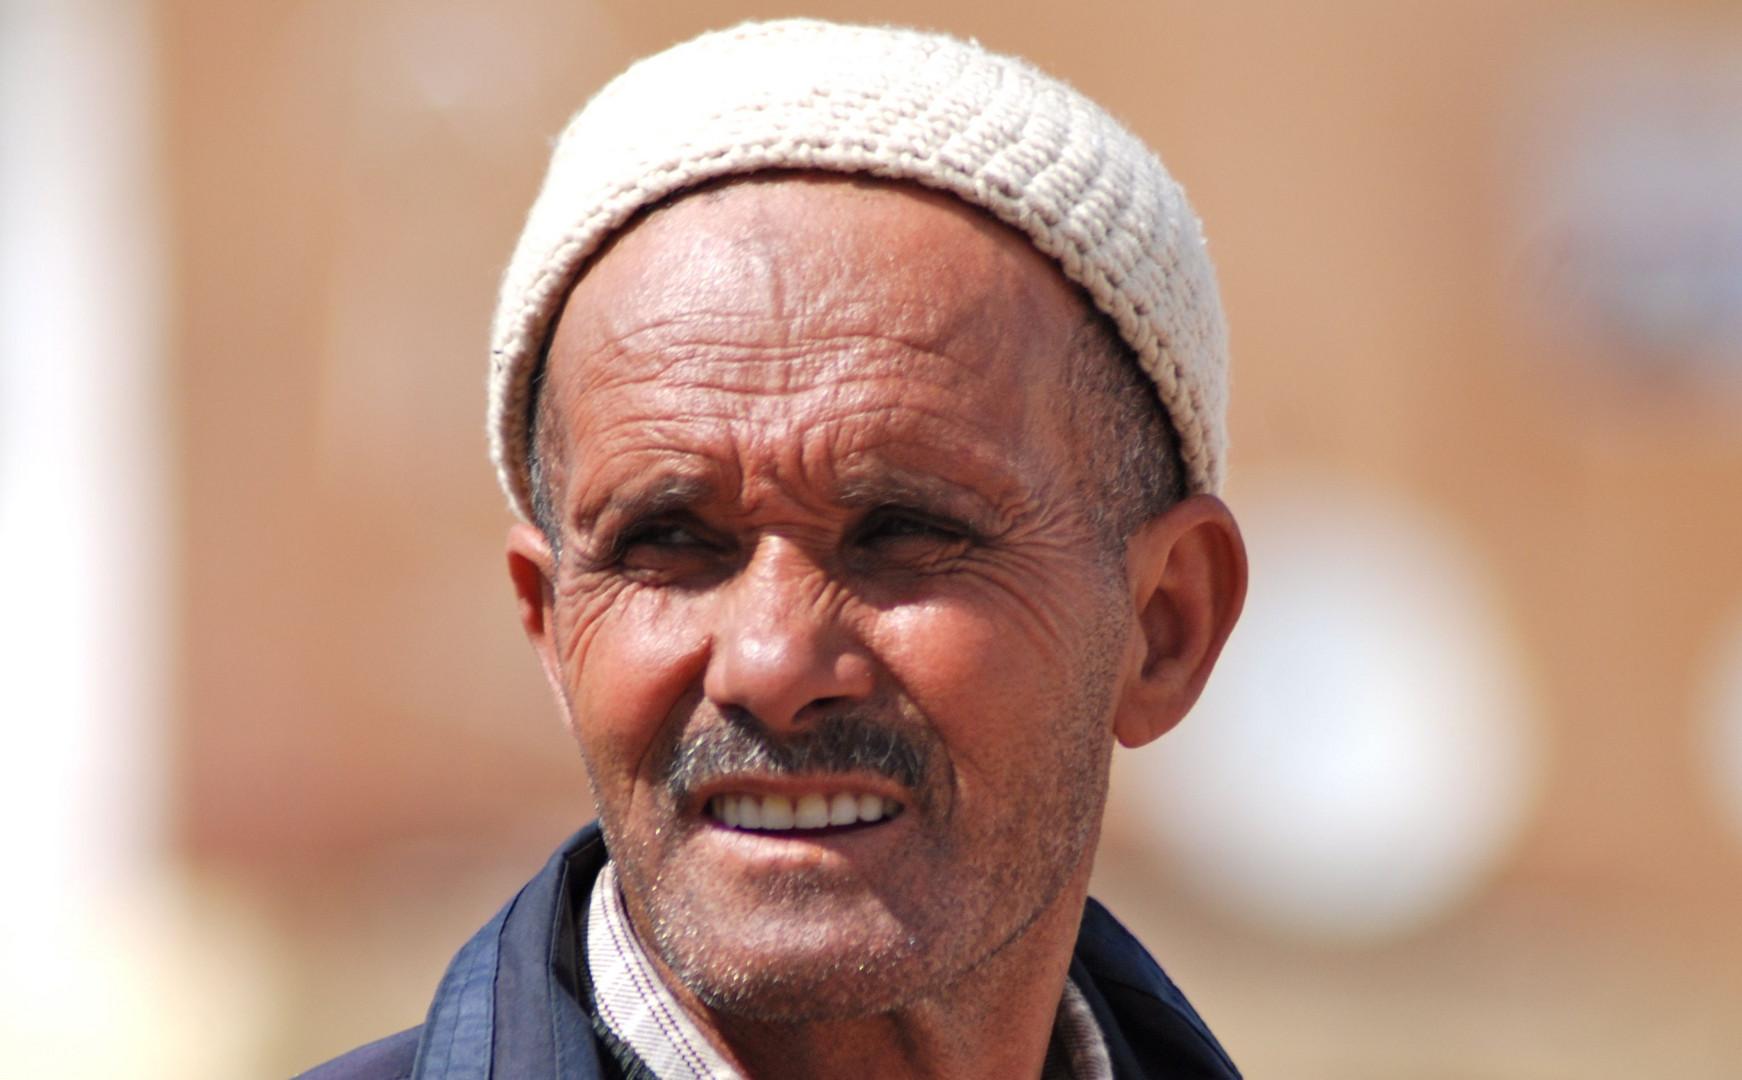 Passant de Meknes